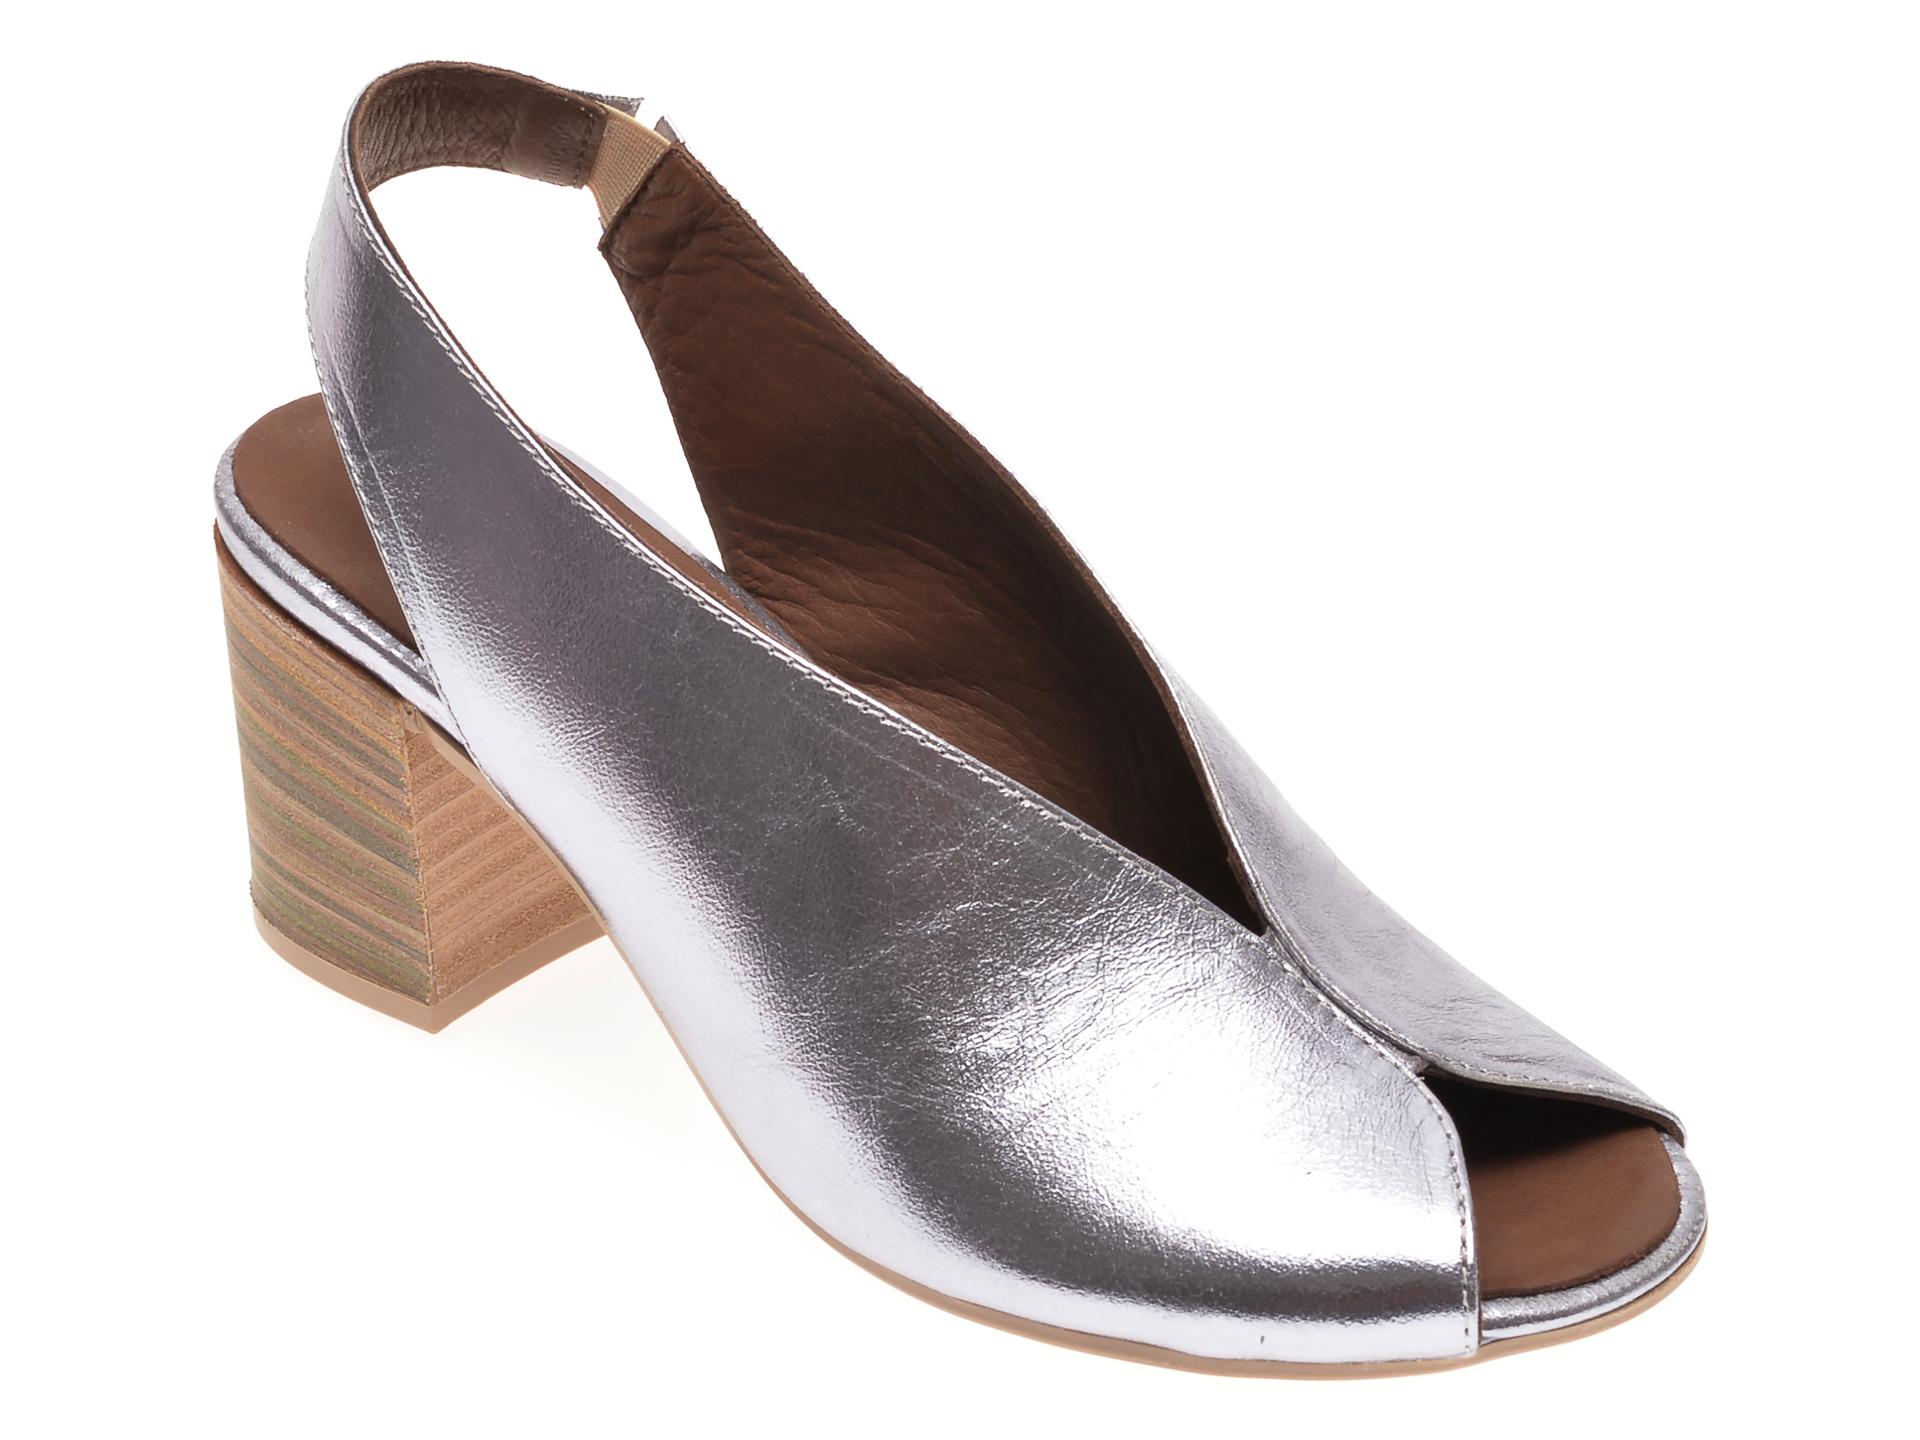 Sandale BABOOS argintii 1806, din piele naturala New